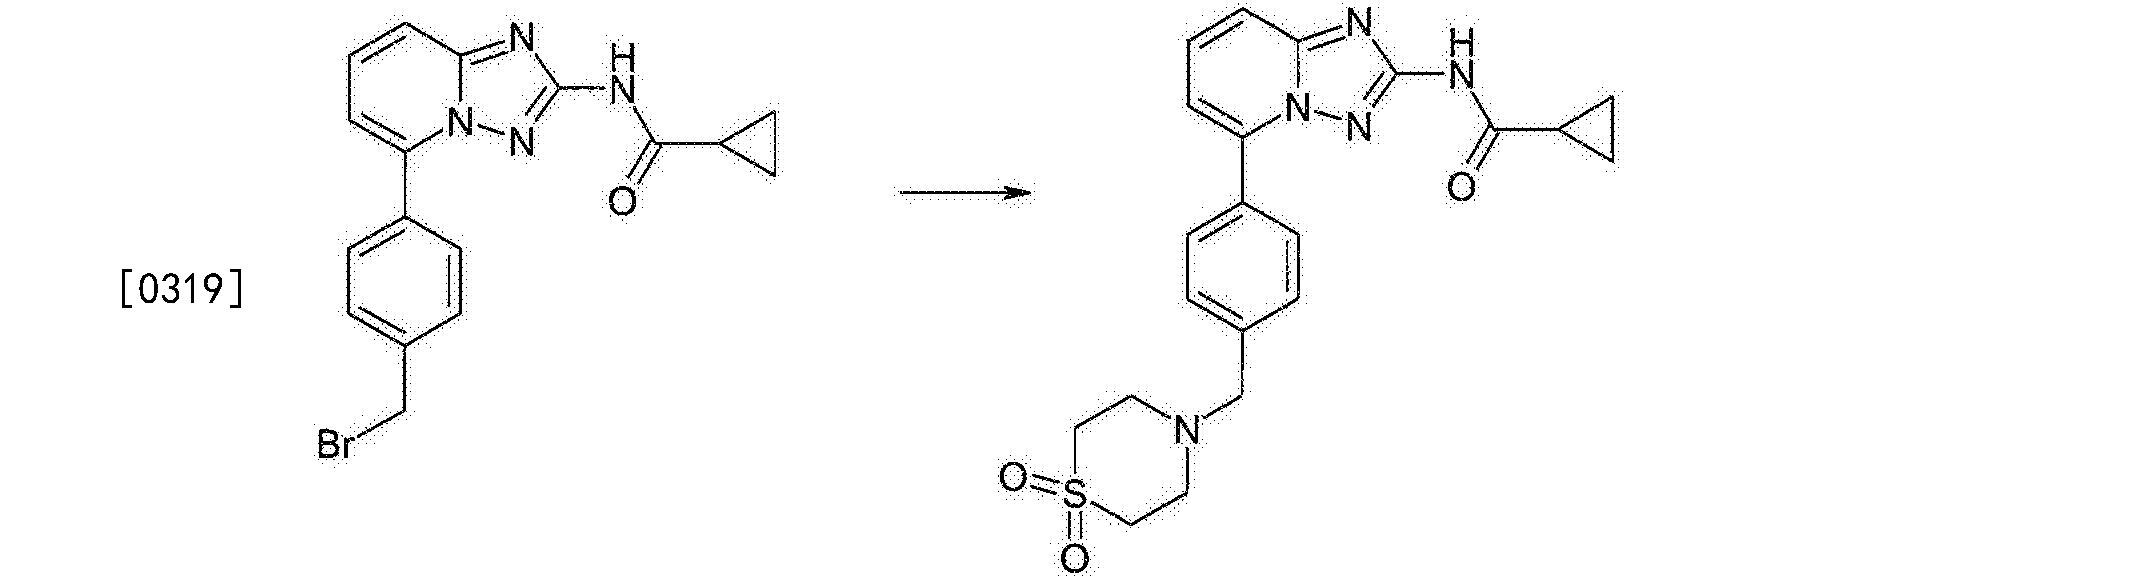 Figure CN105960407AD00353